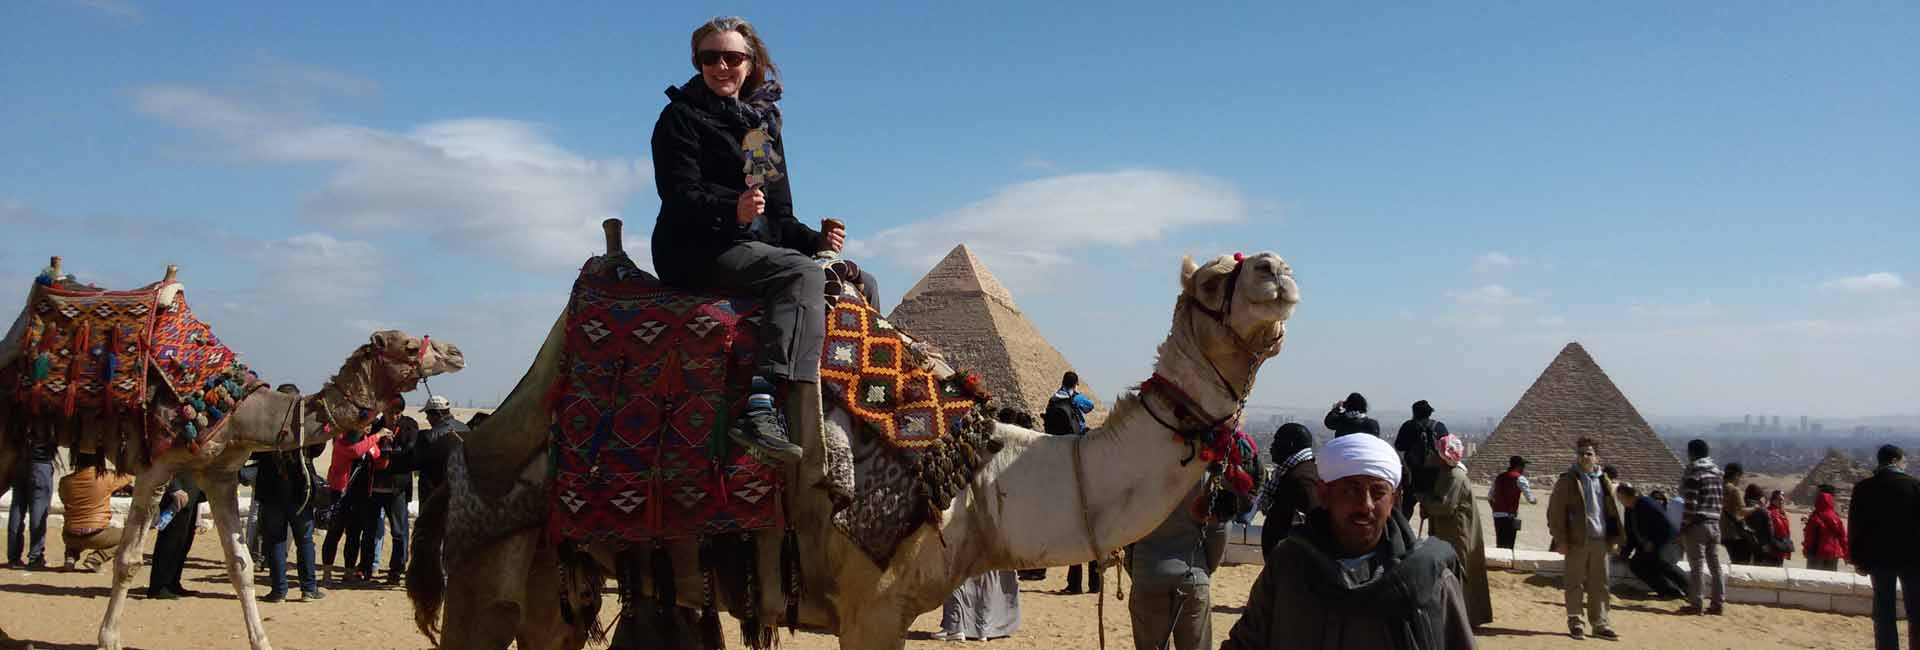 Pyramids and Nile Cruise Holidays